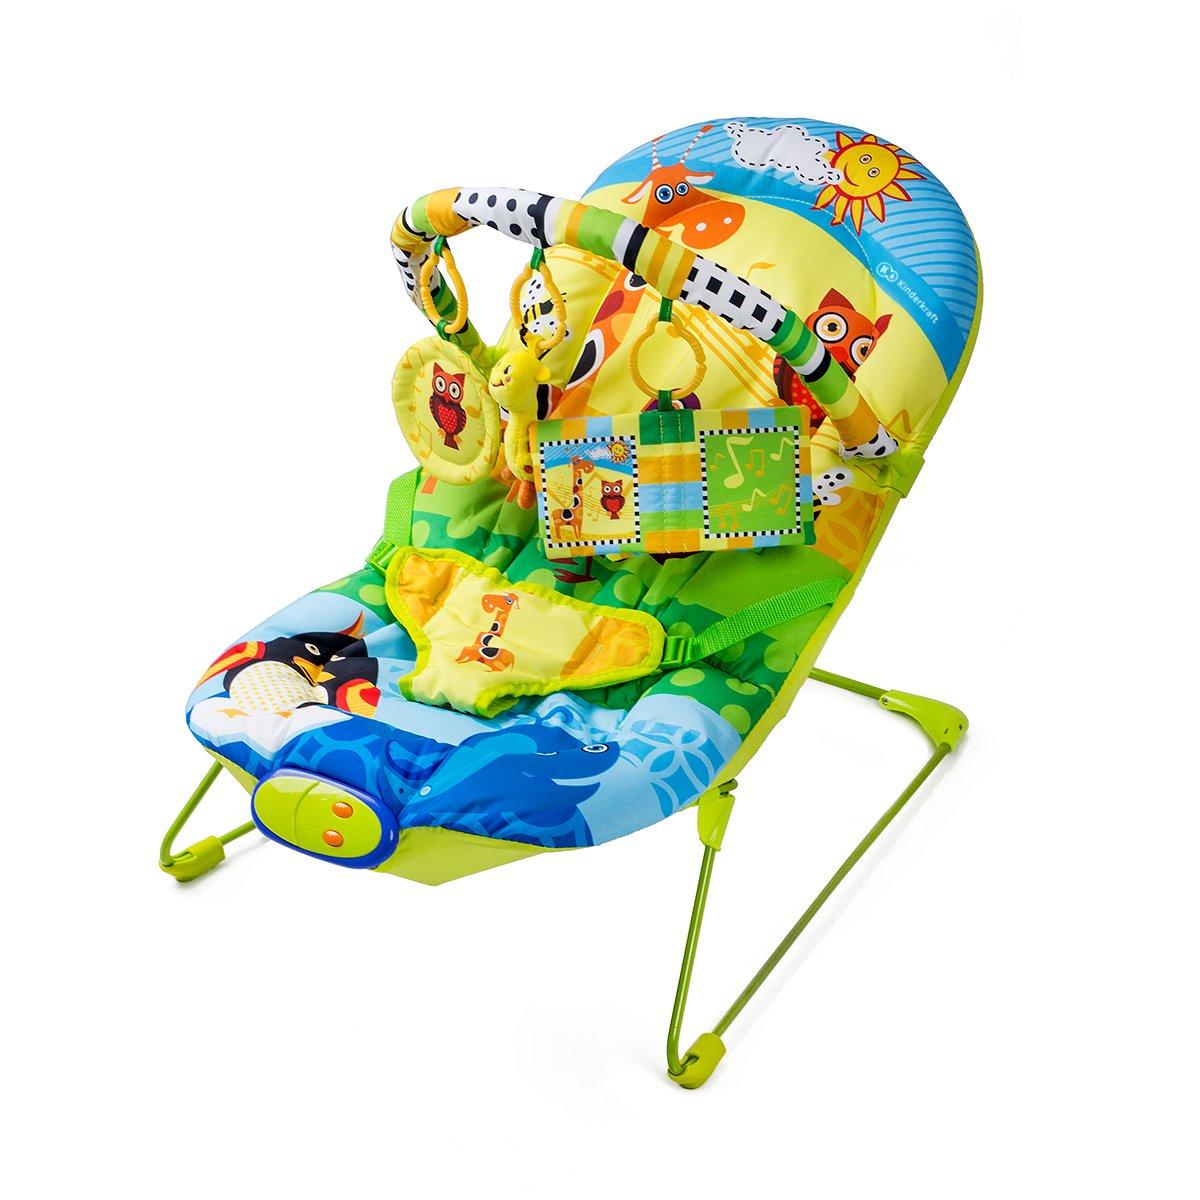 Kinderkraft Animals Babywippe Babyschaukel Sitz KKLEANIM000000